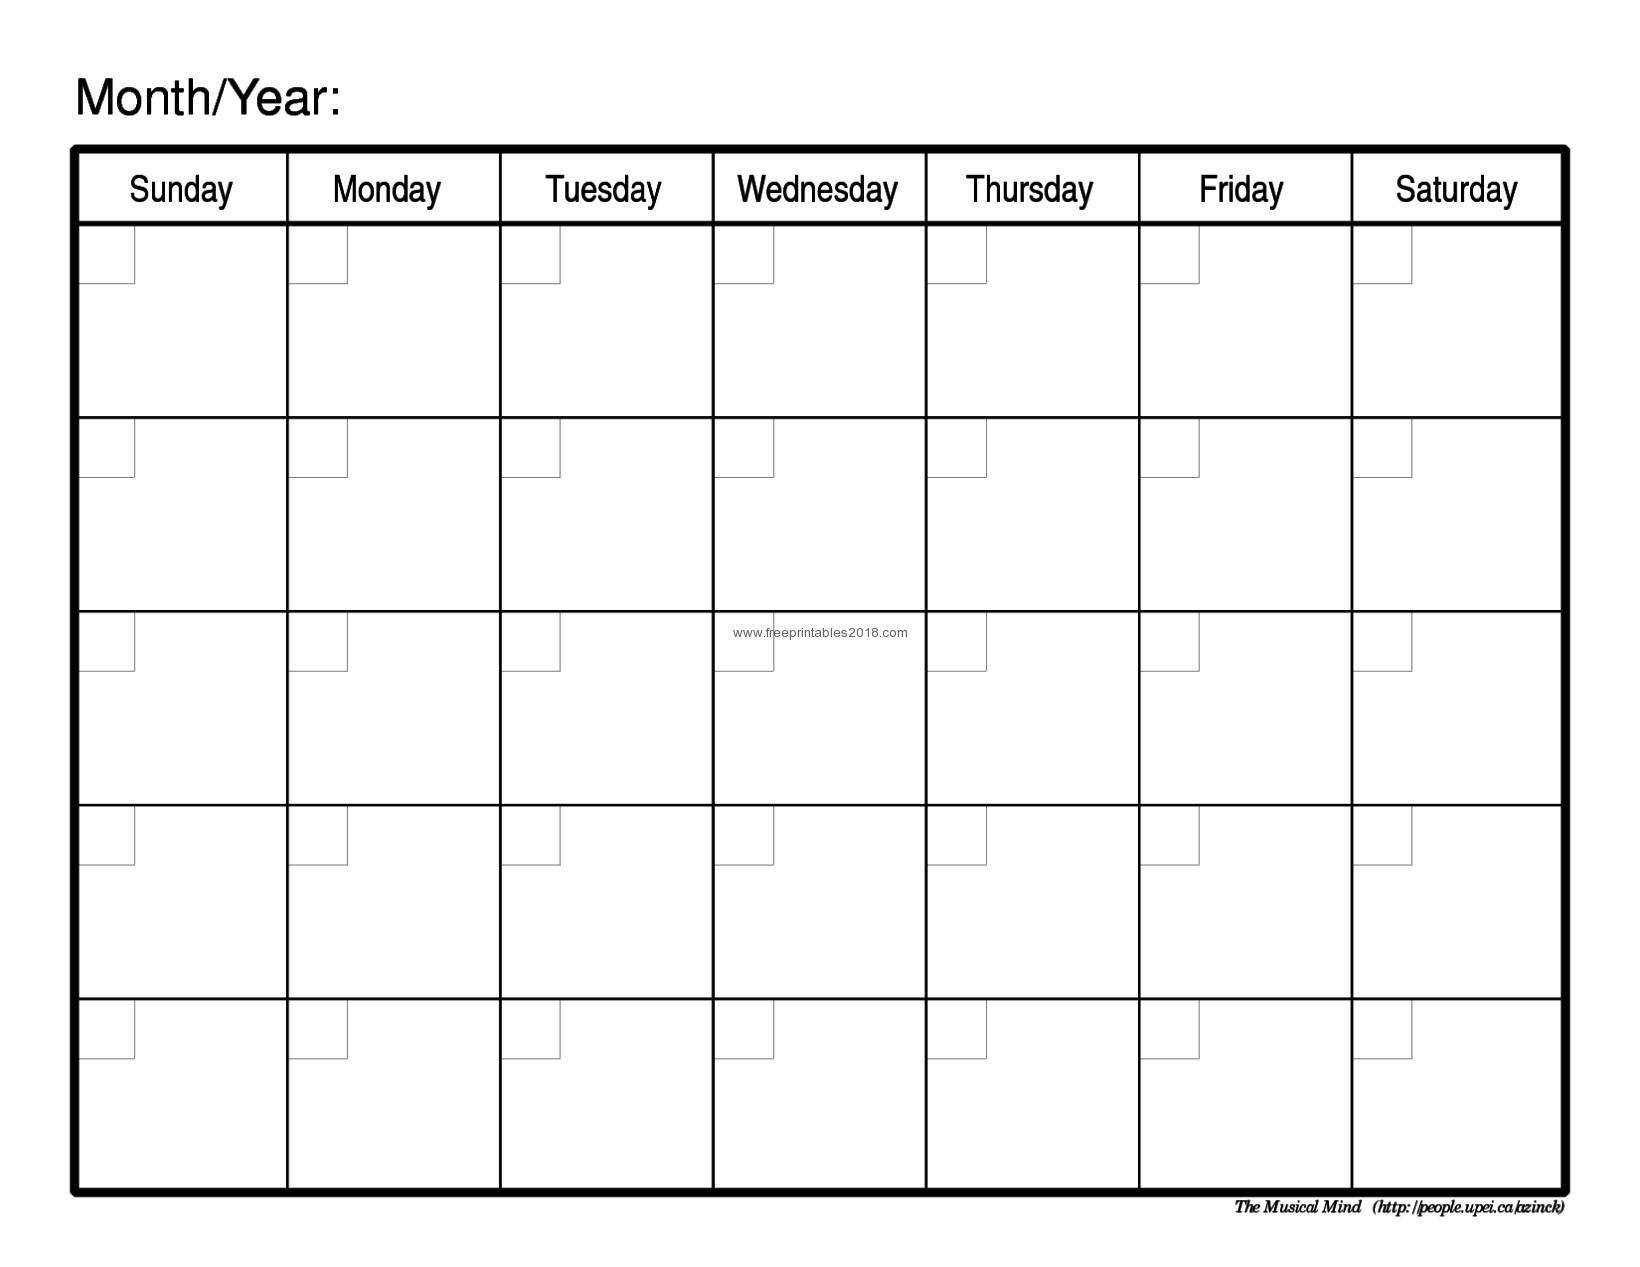 Free Printable Calendar Blank Free Printable Blank Calendar_A Printable Blank Calendar